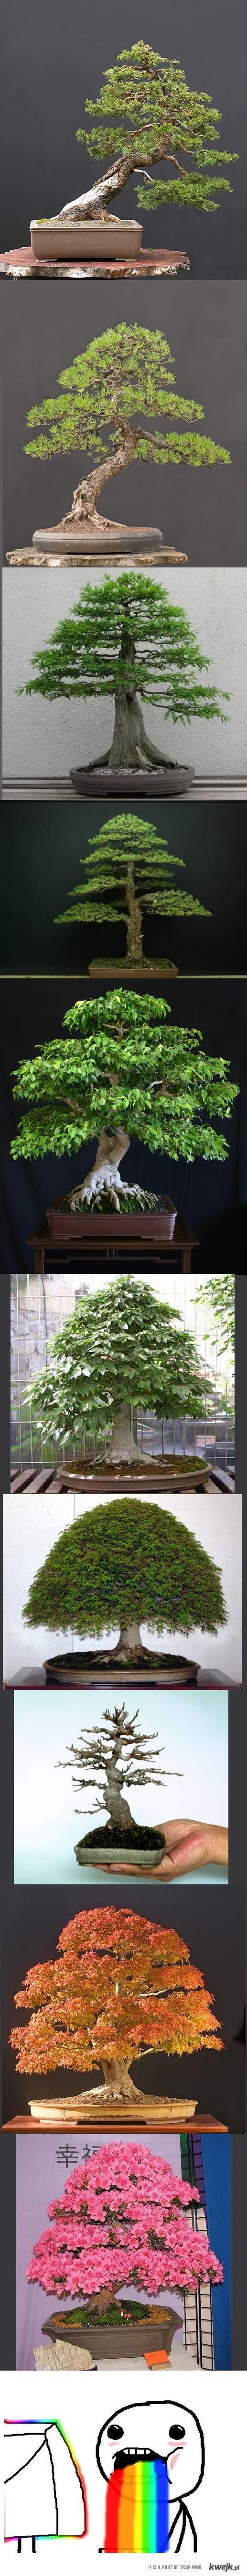 Drzewka bonsai kompilacja